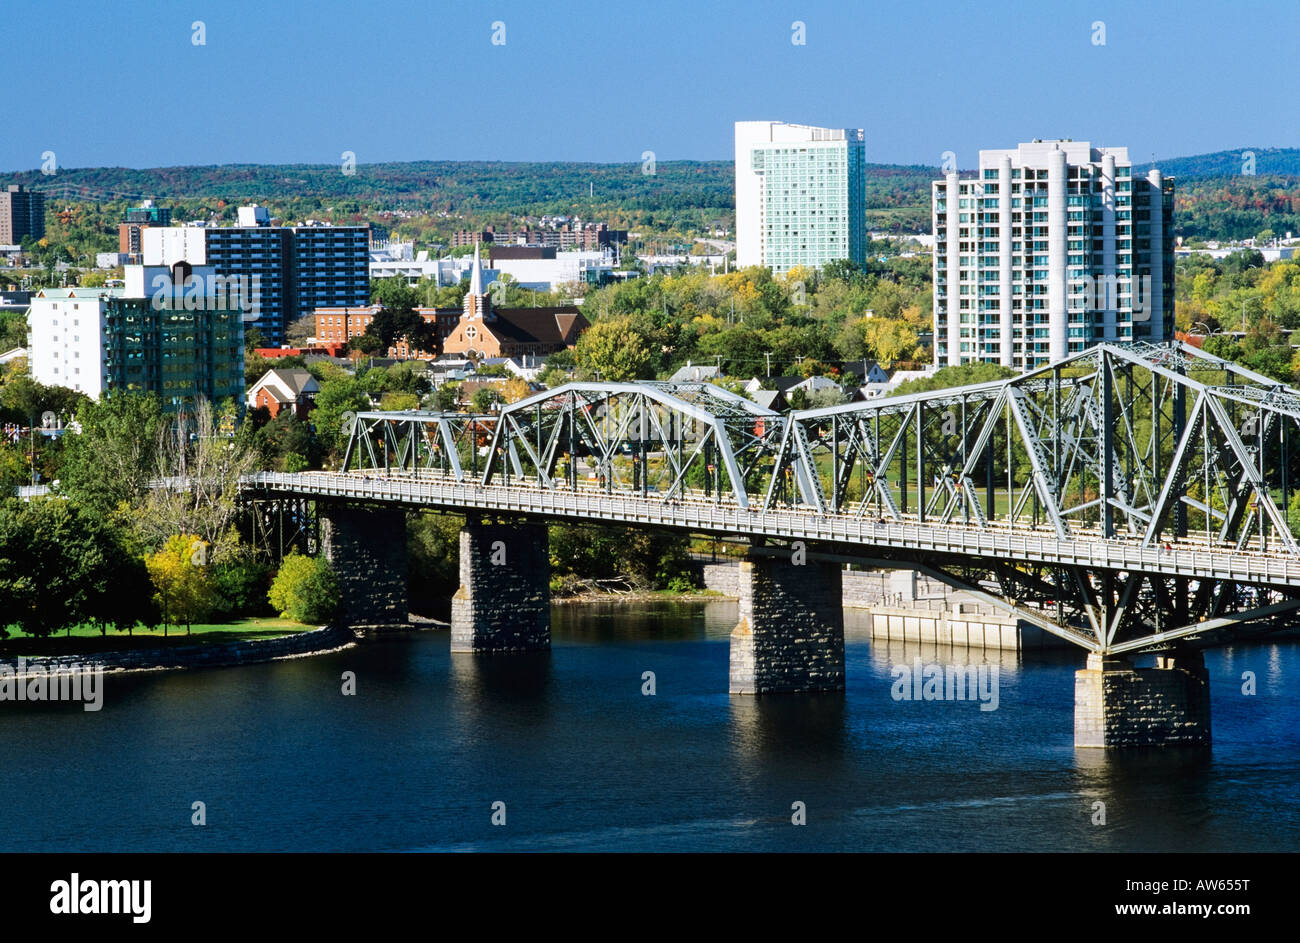 View of Hull and the Alexandra Bridge spanning the Ottawa River, Ottawa, Ontario, Canada - Stock Image